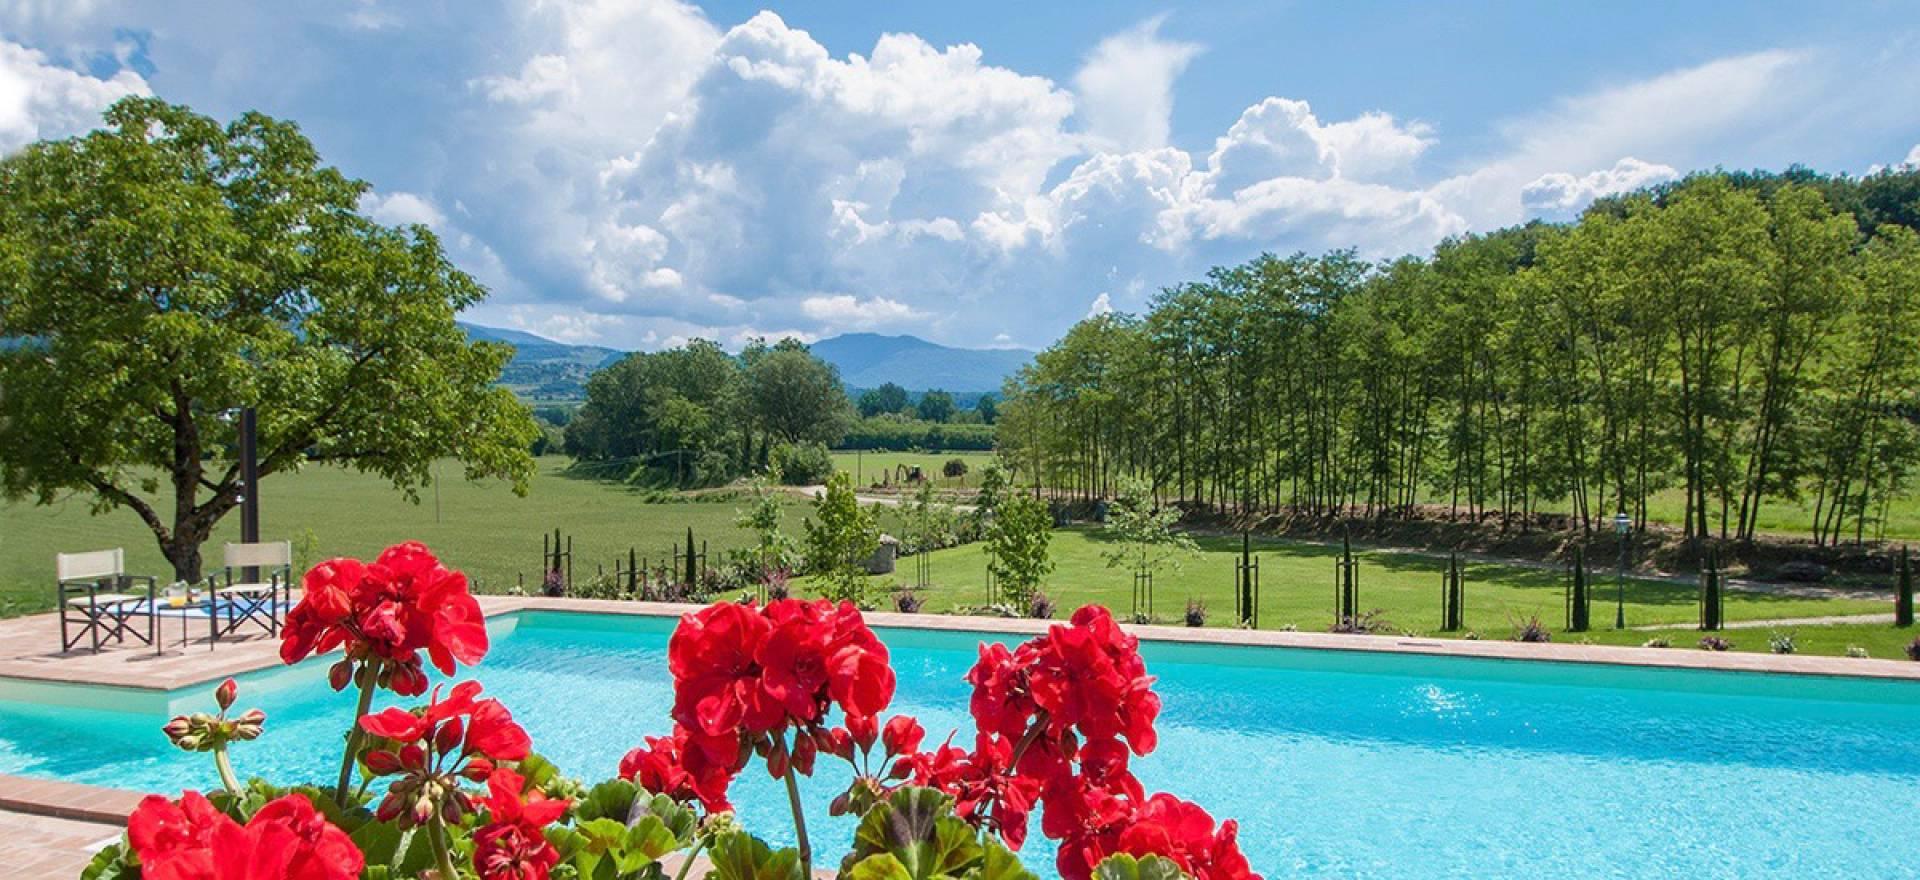 Agriturismo Toscane Agriturismo in Toscane geschikt voor 4 families